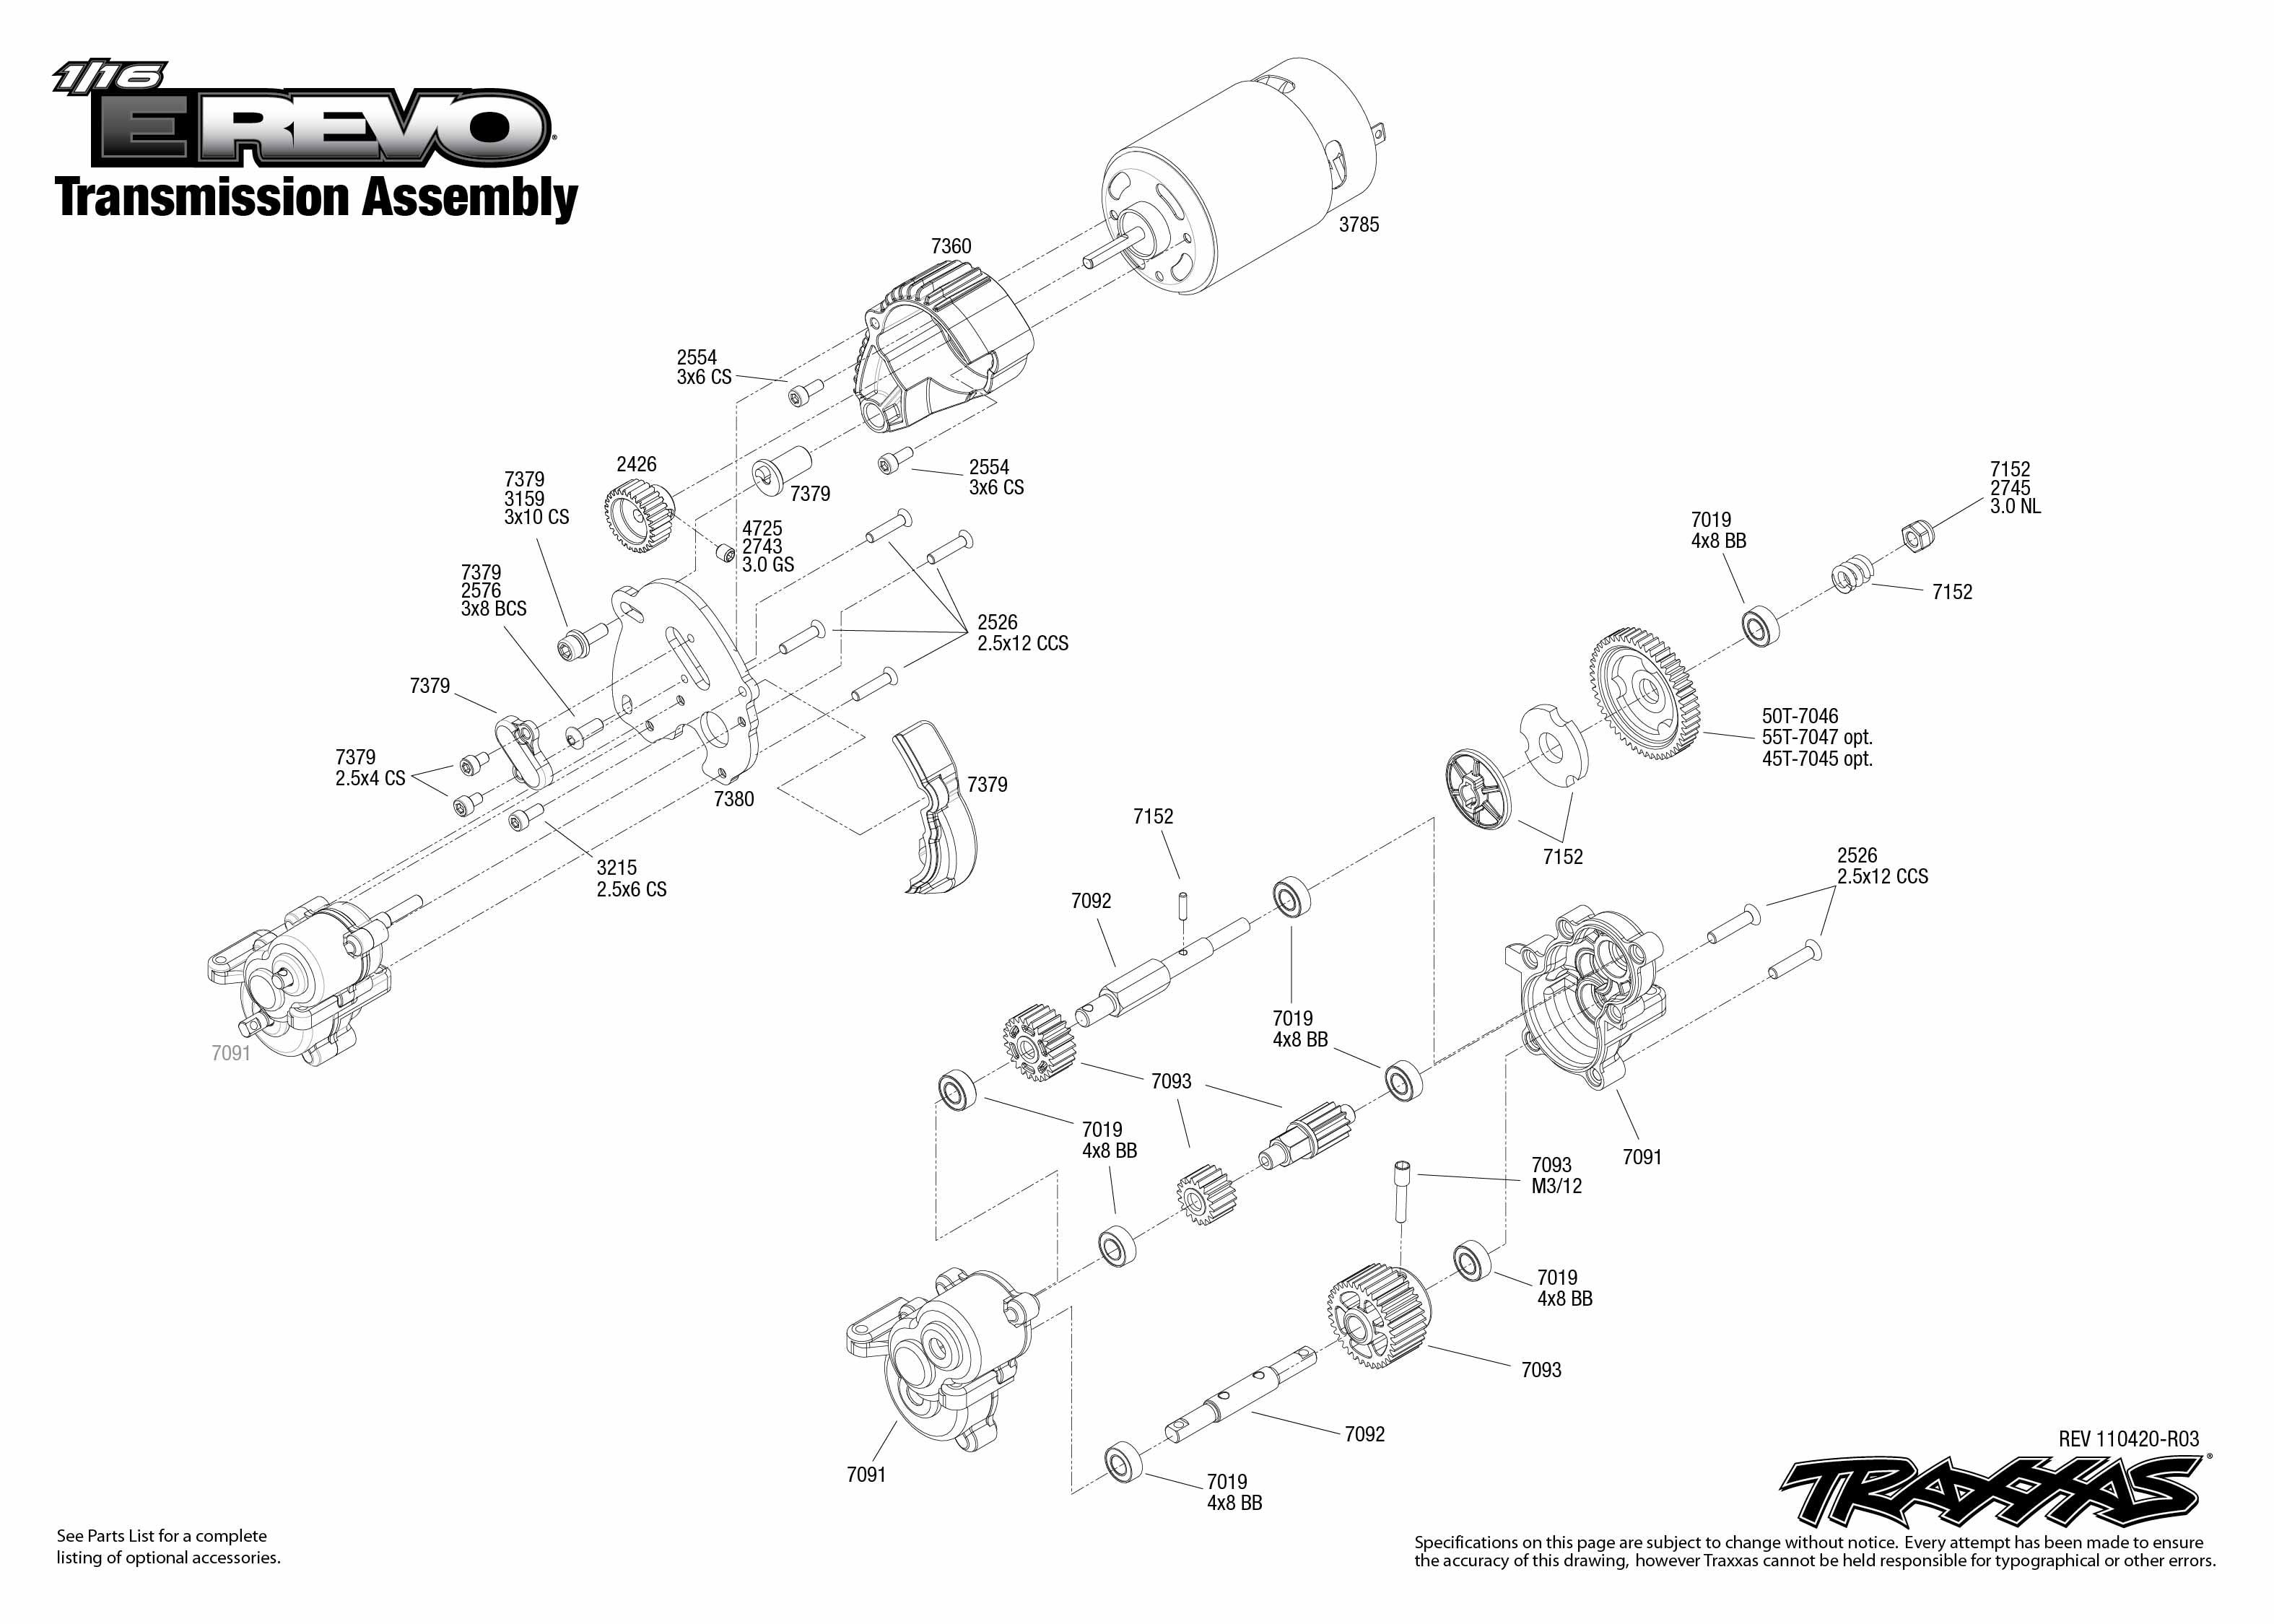 traxxas t maxx 2 5 transmission diagram ford 4000 tractor ignition switch wiring jato revo 3